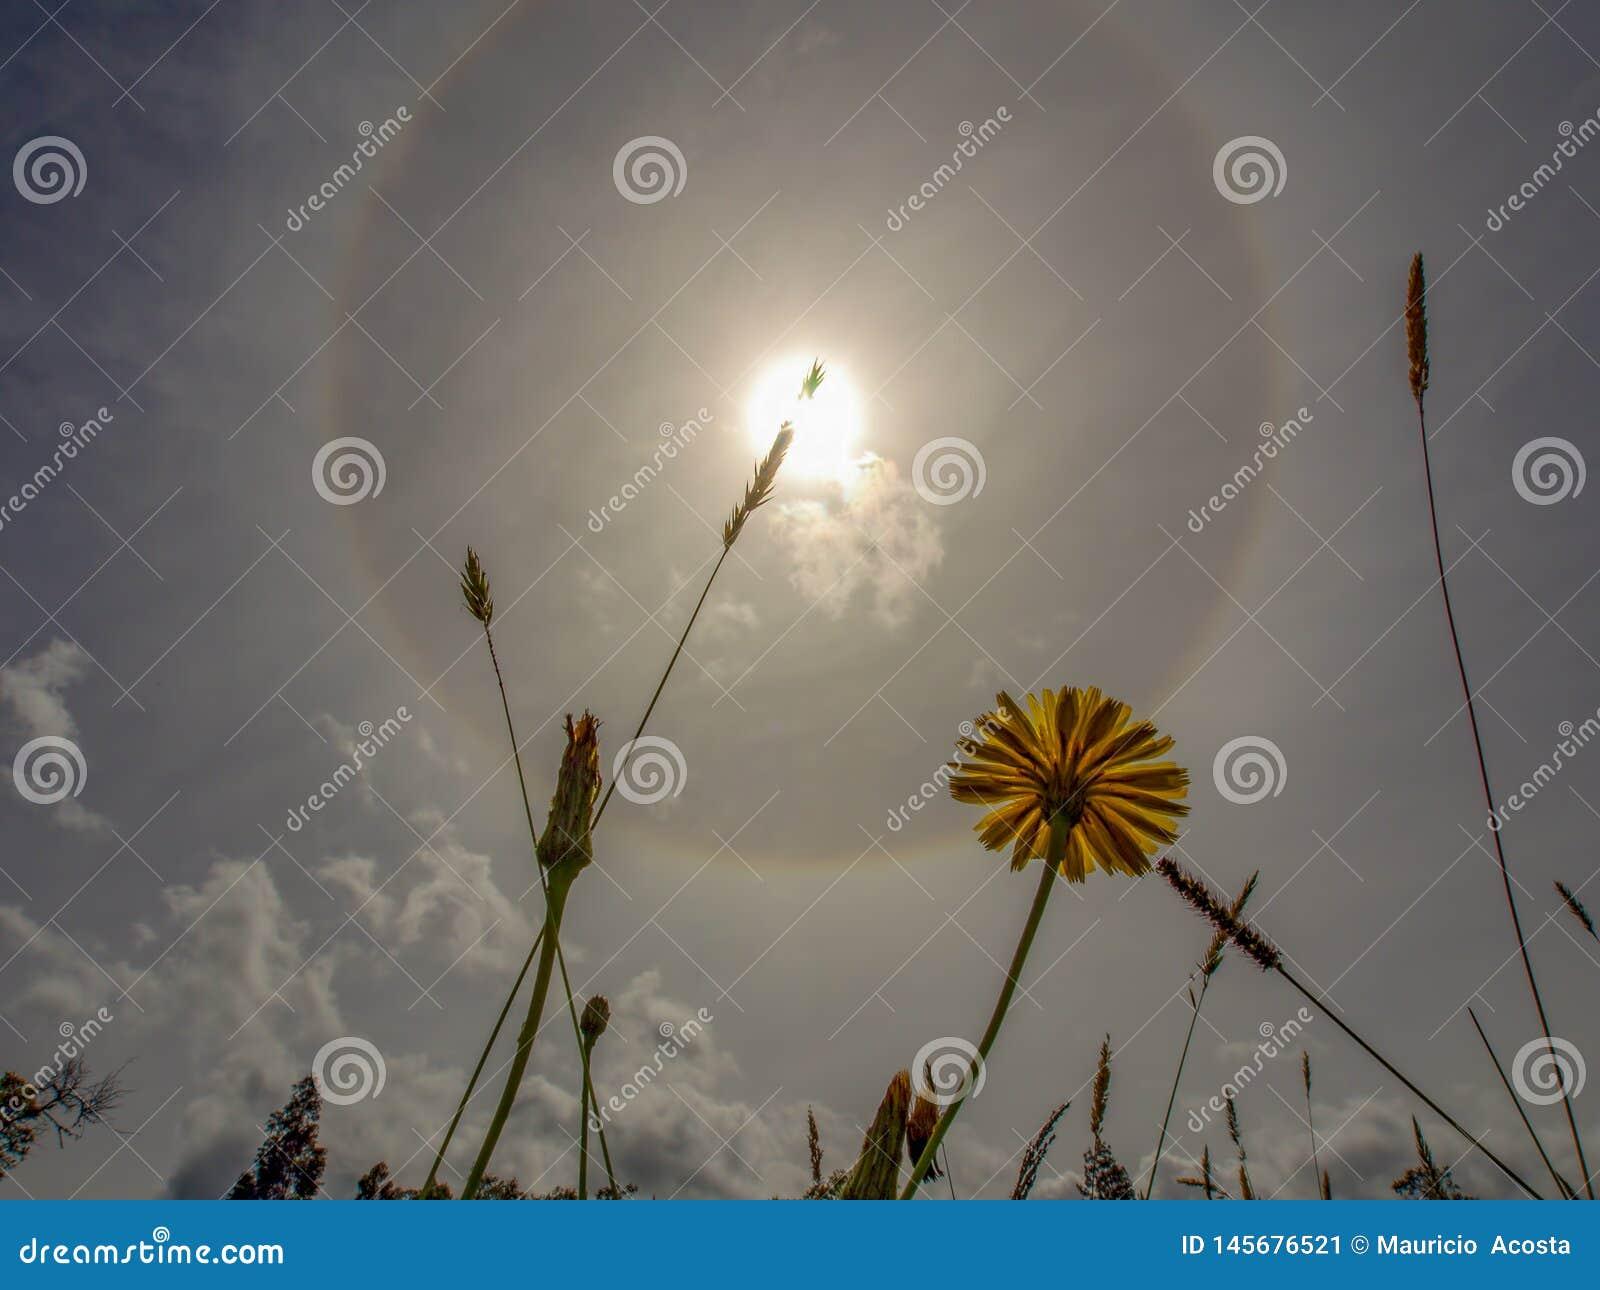 Цветок одуванчика и некоторая трава